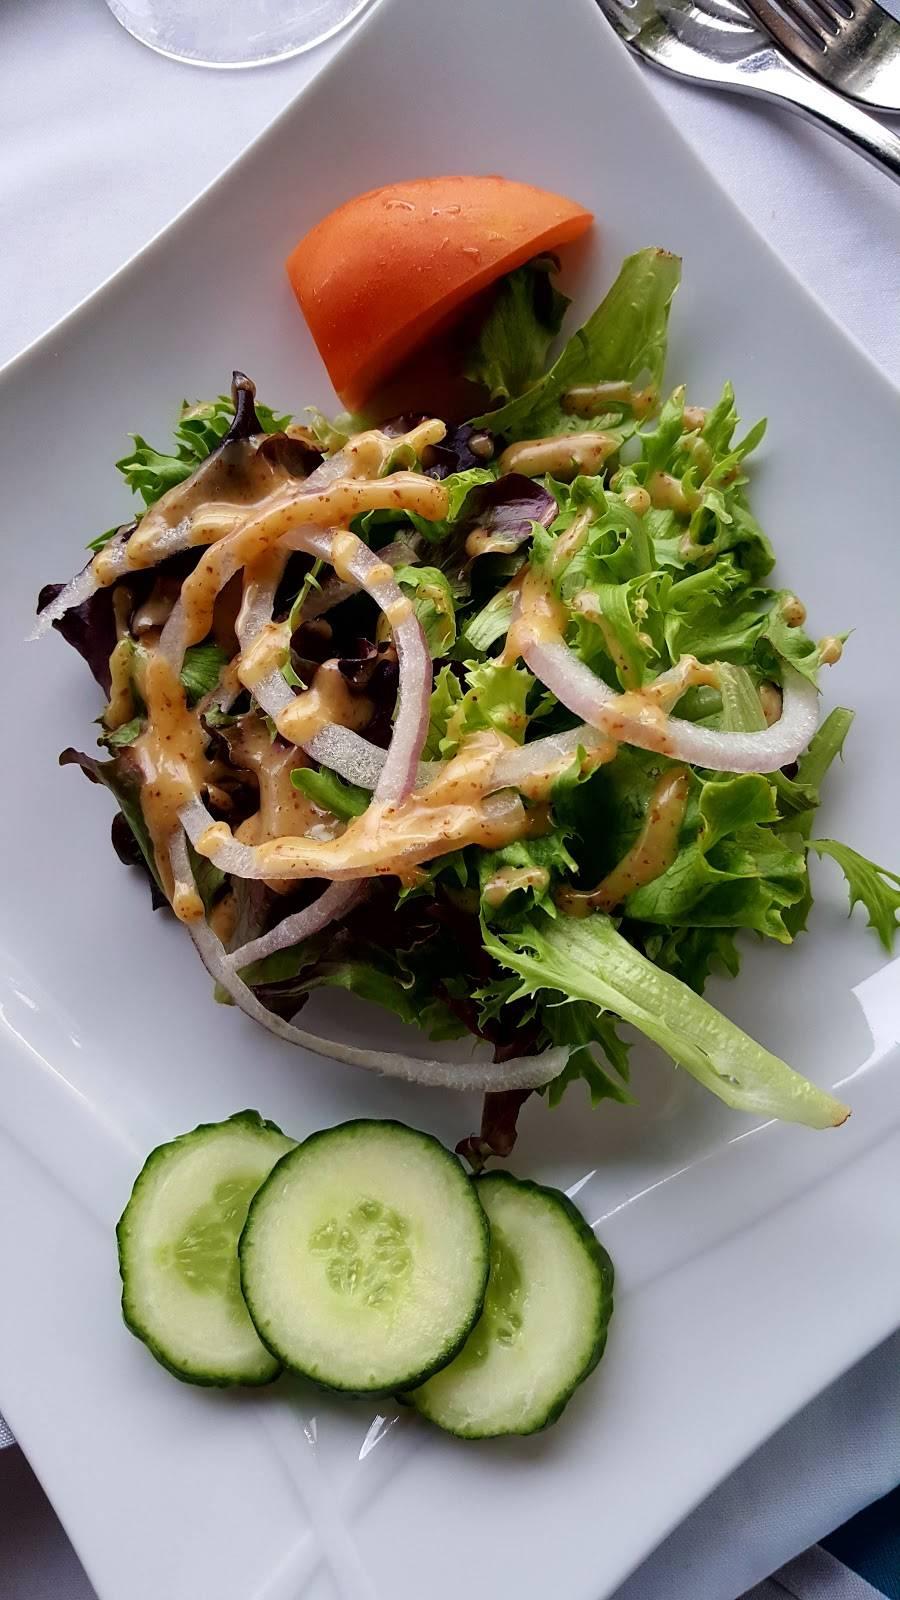 AQUA Restaurant   restaurant   413 N Main St, Plymouth, MI 48170, USA   7343357474 OR +1 734-335-7474